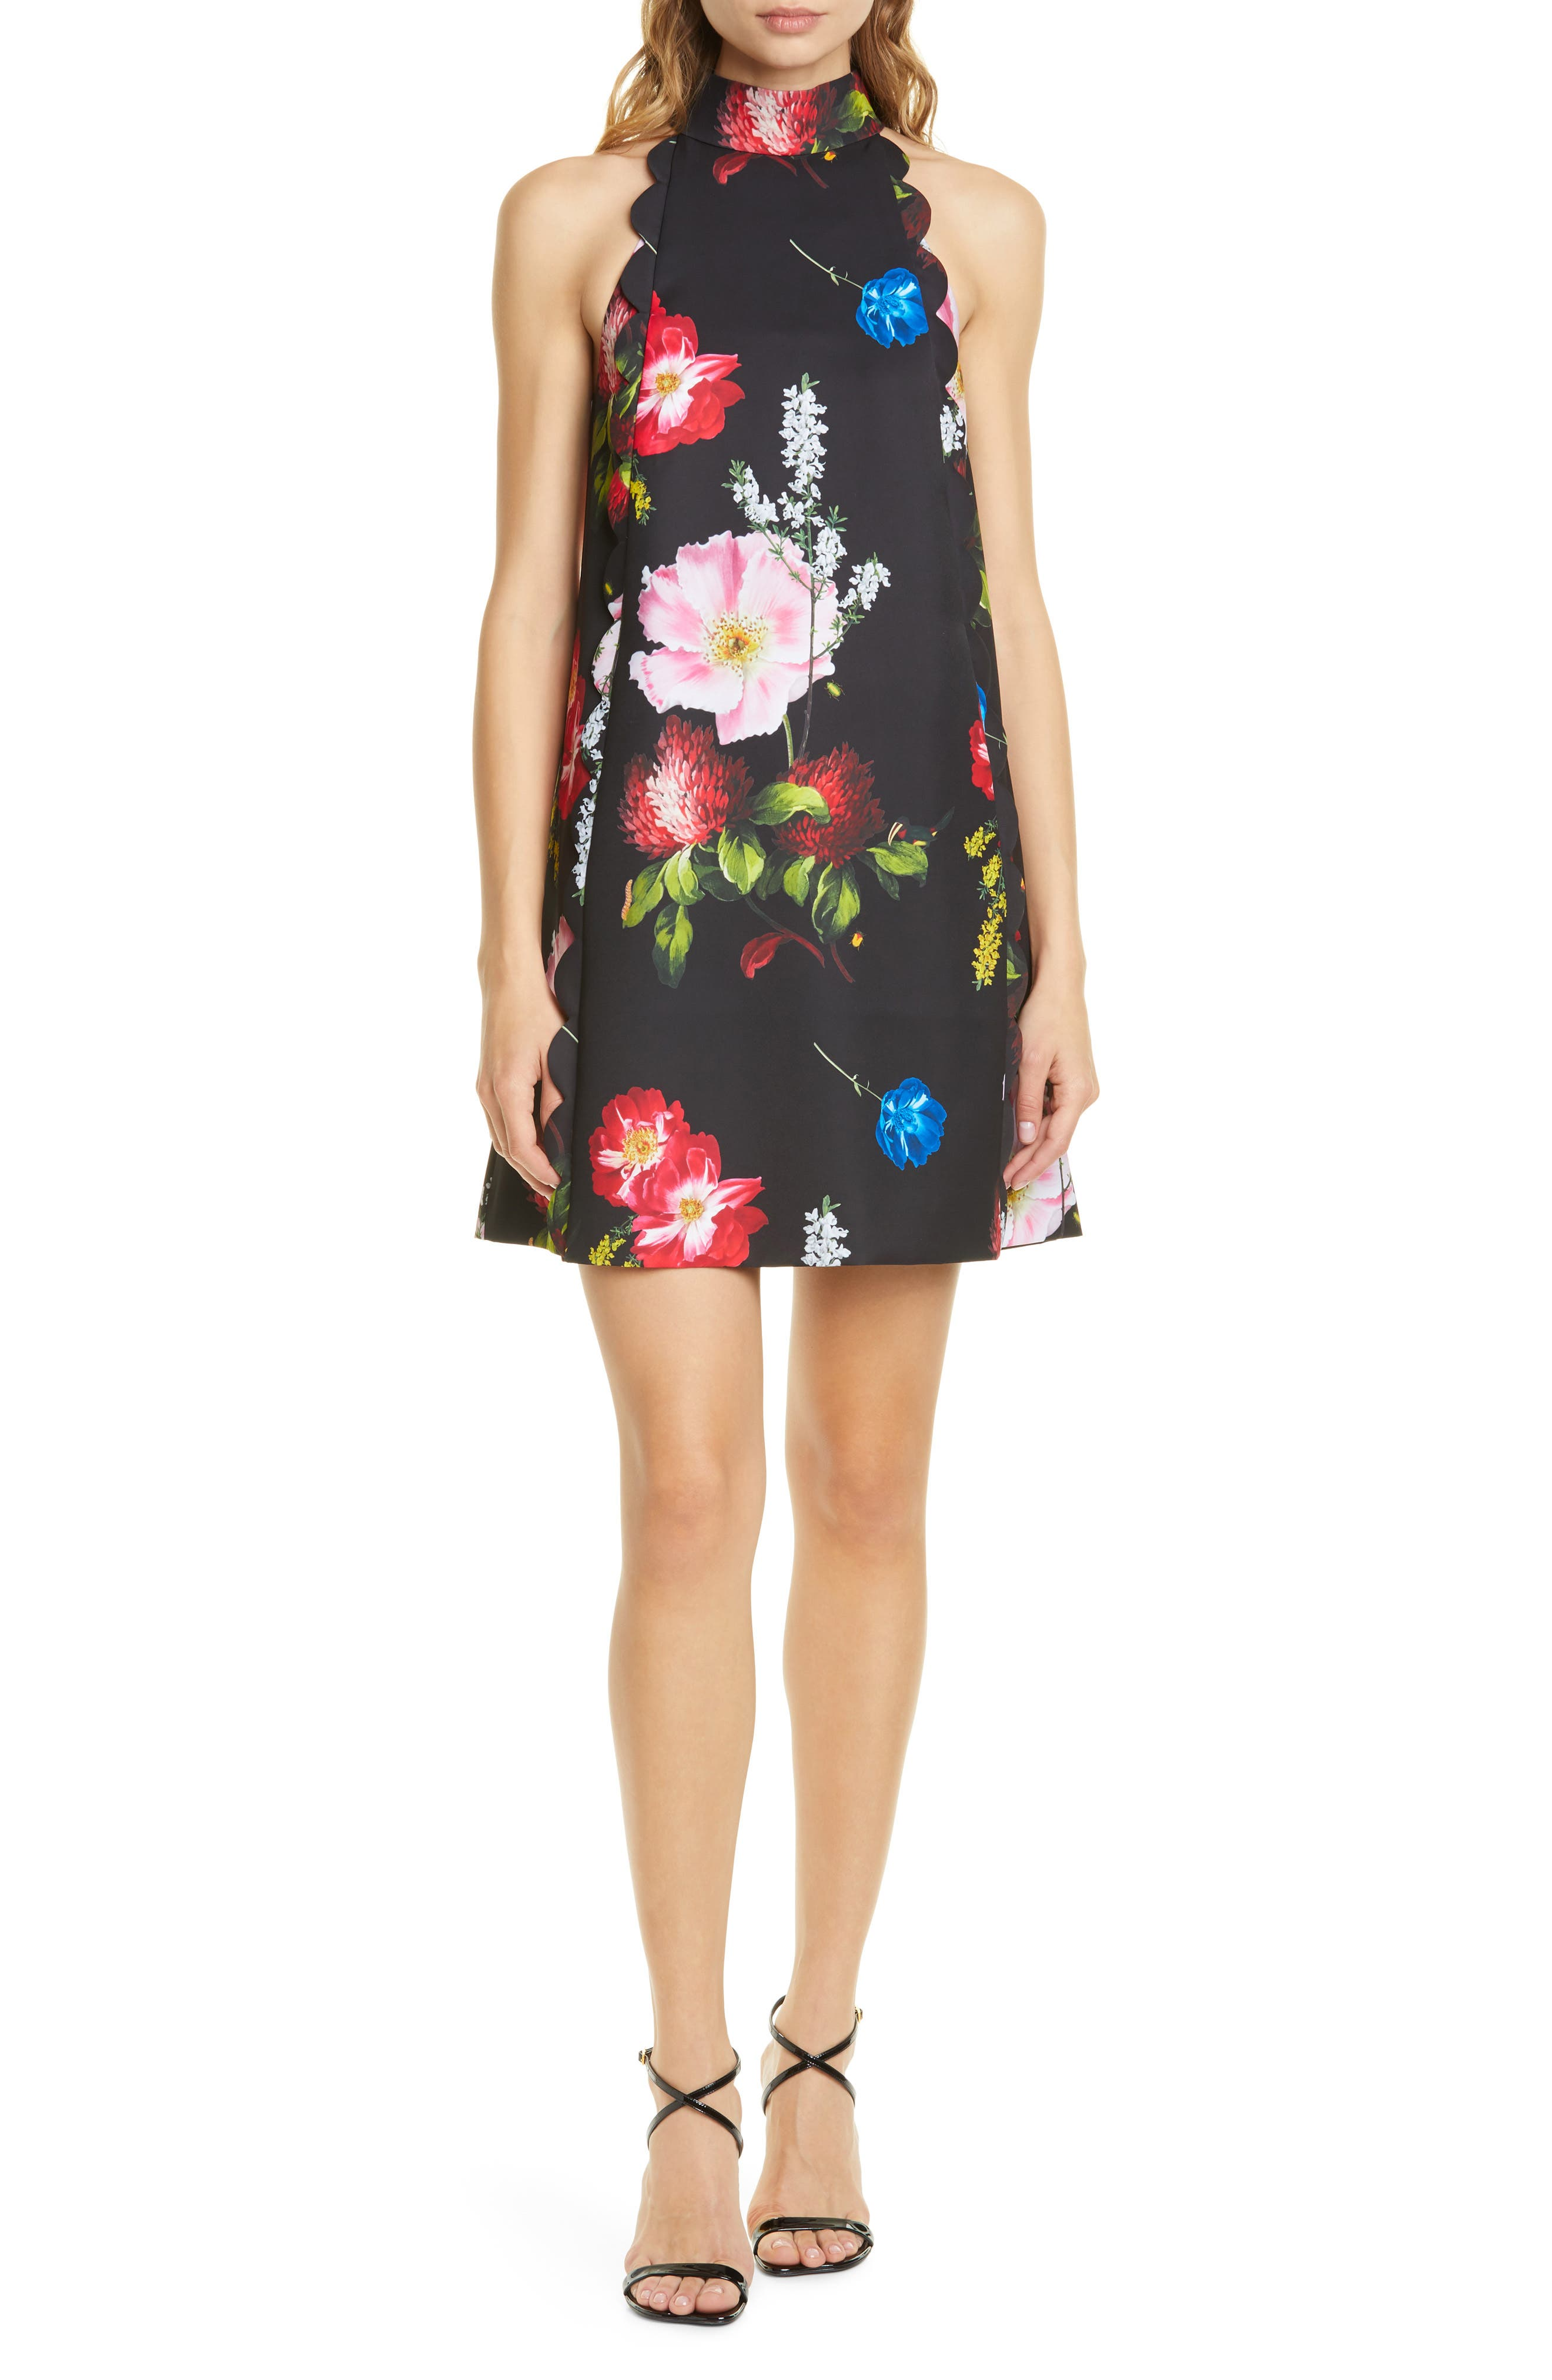 Ted Baker London Berry Sundae Floral Scallop Shift Dress, Black